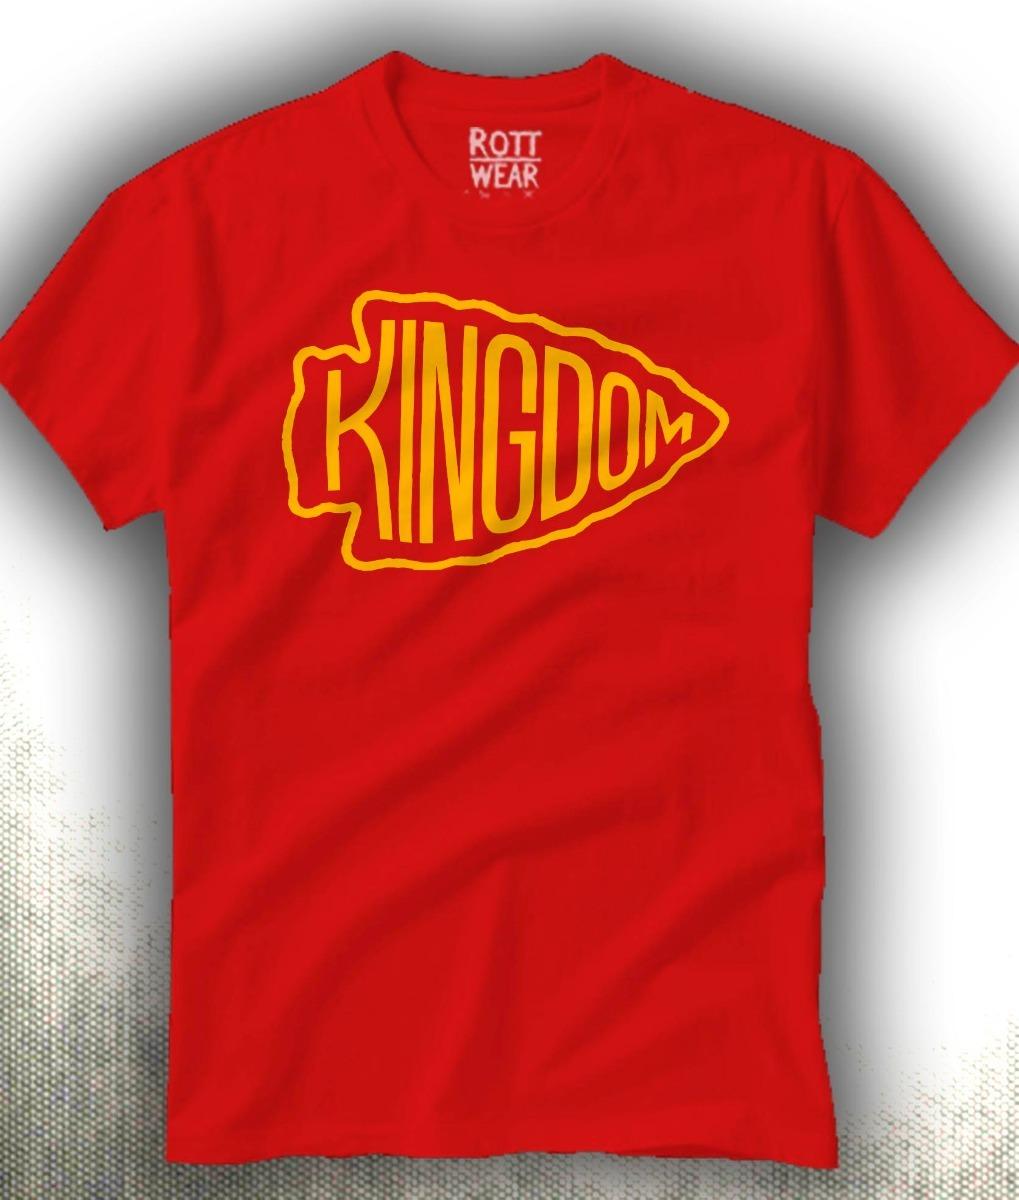 sports shoes 1b482 6d6a4 Kansas City Chiefs Kingdom Kc Nfl Playera Rott Wear